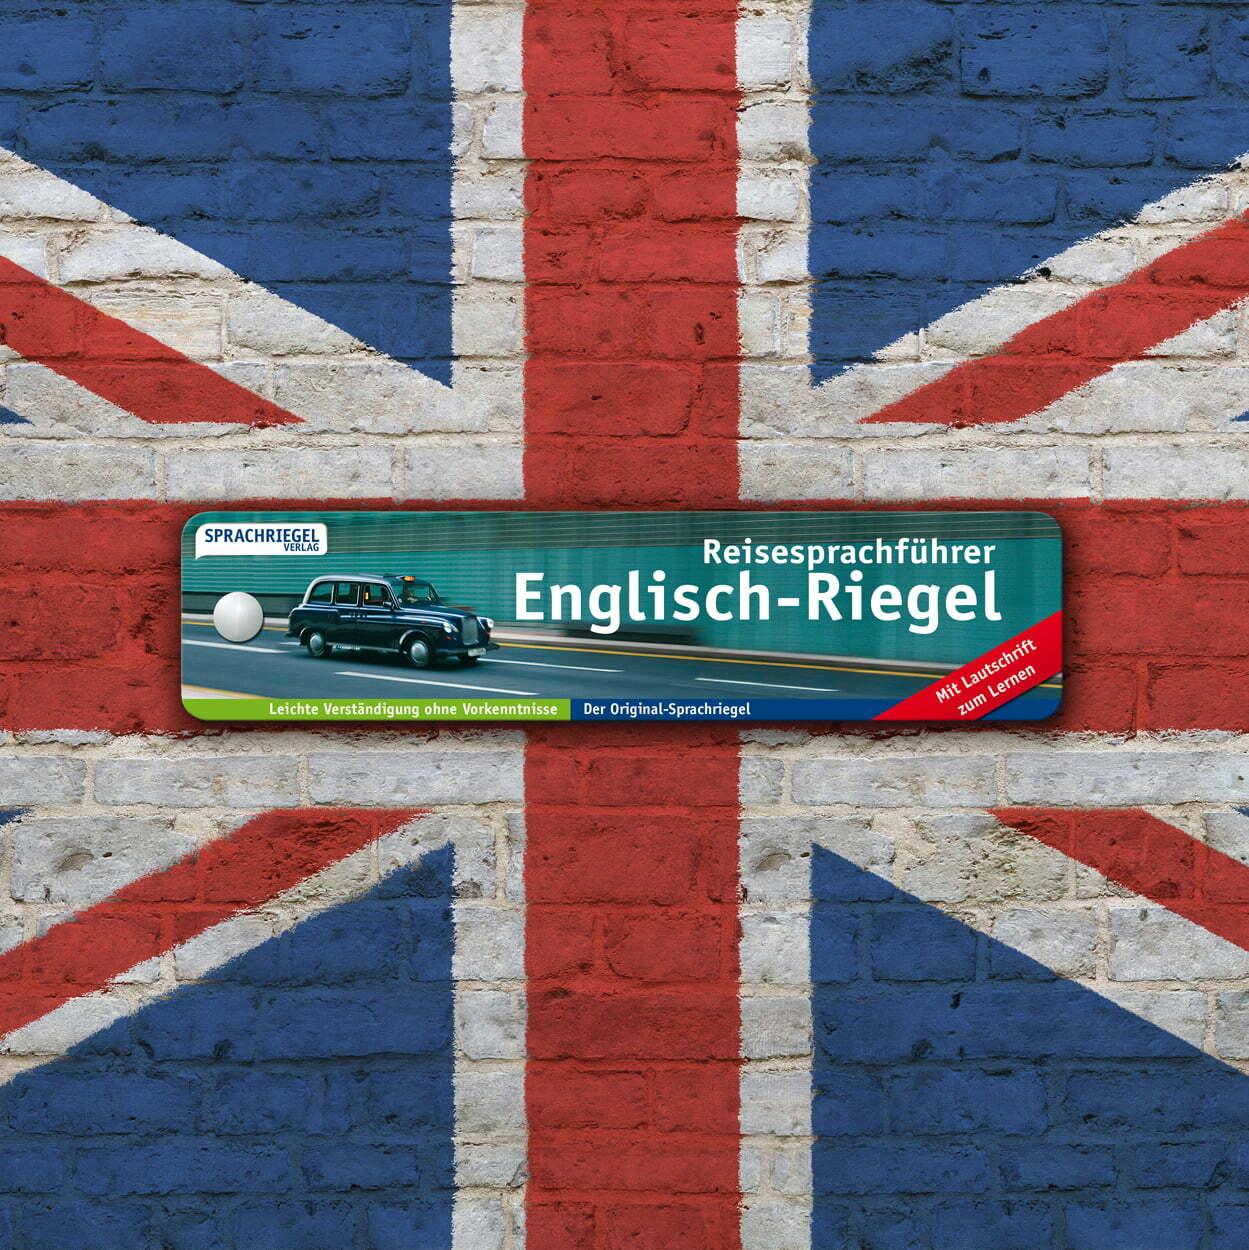 Englisch-Riegel